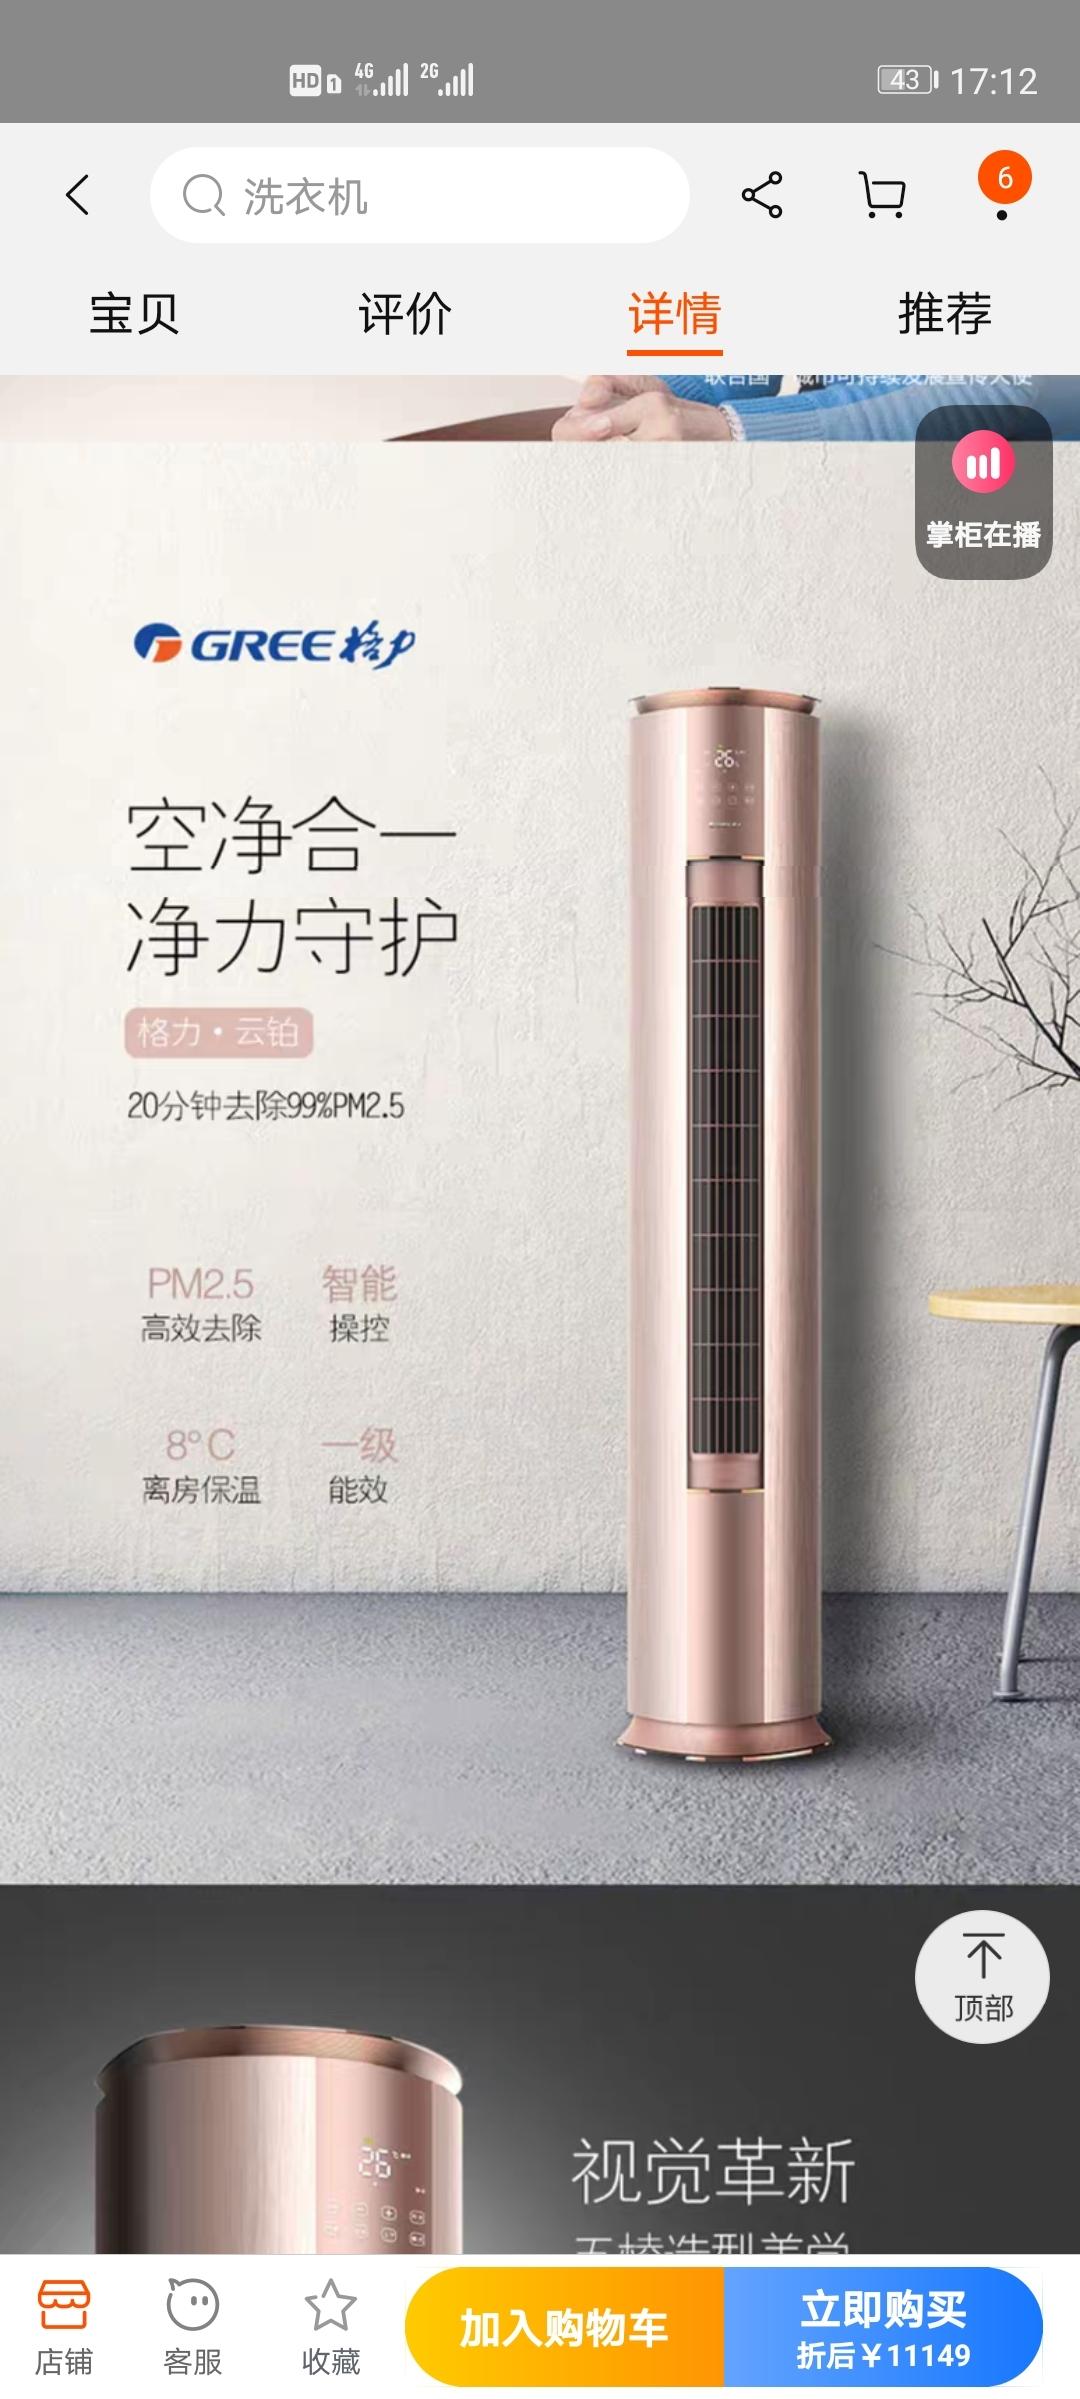 Screenshot_20200508_171217_com.taobao.taobao.jpg